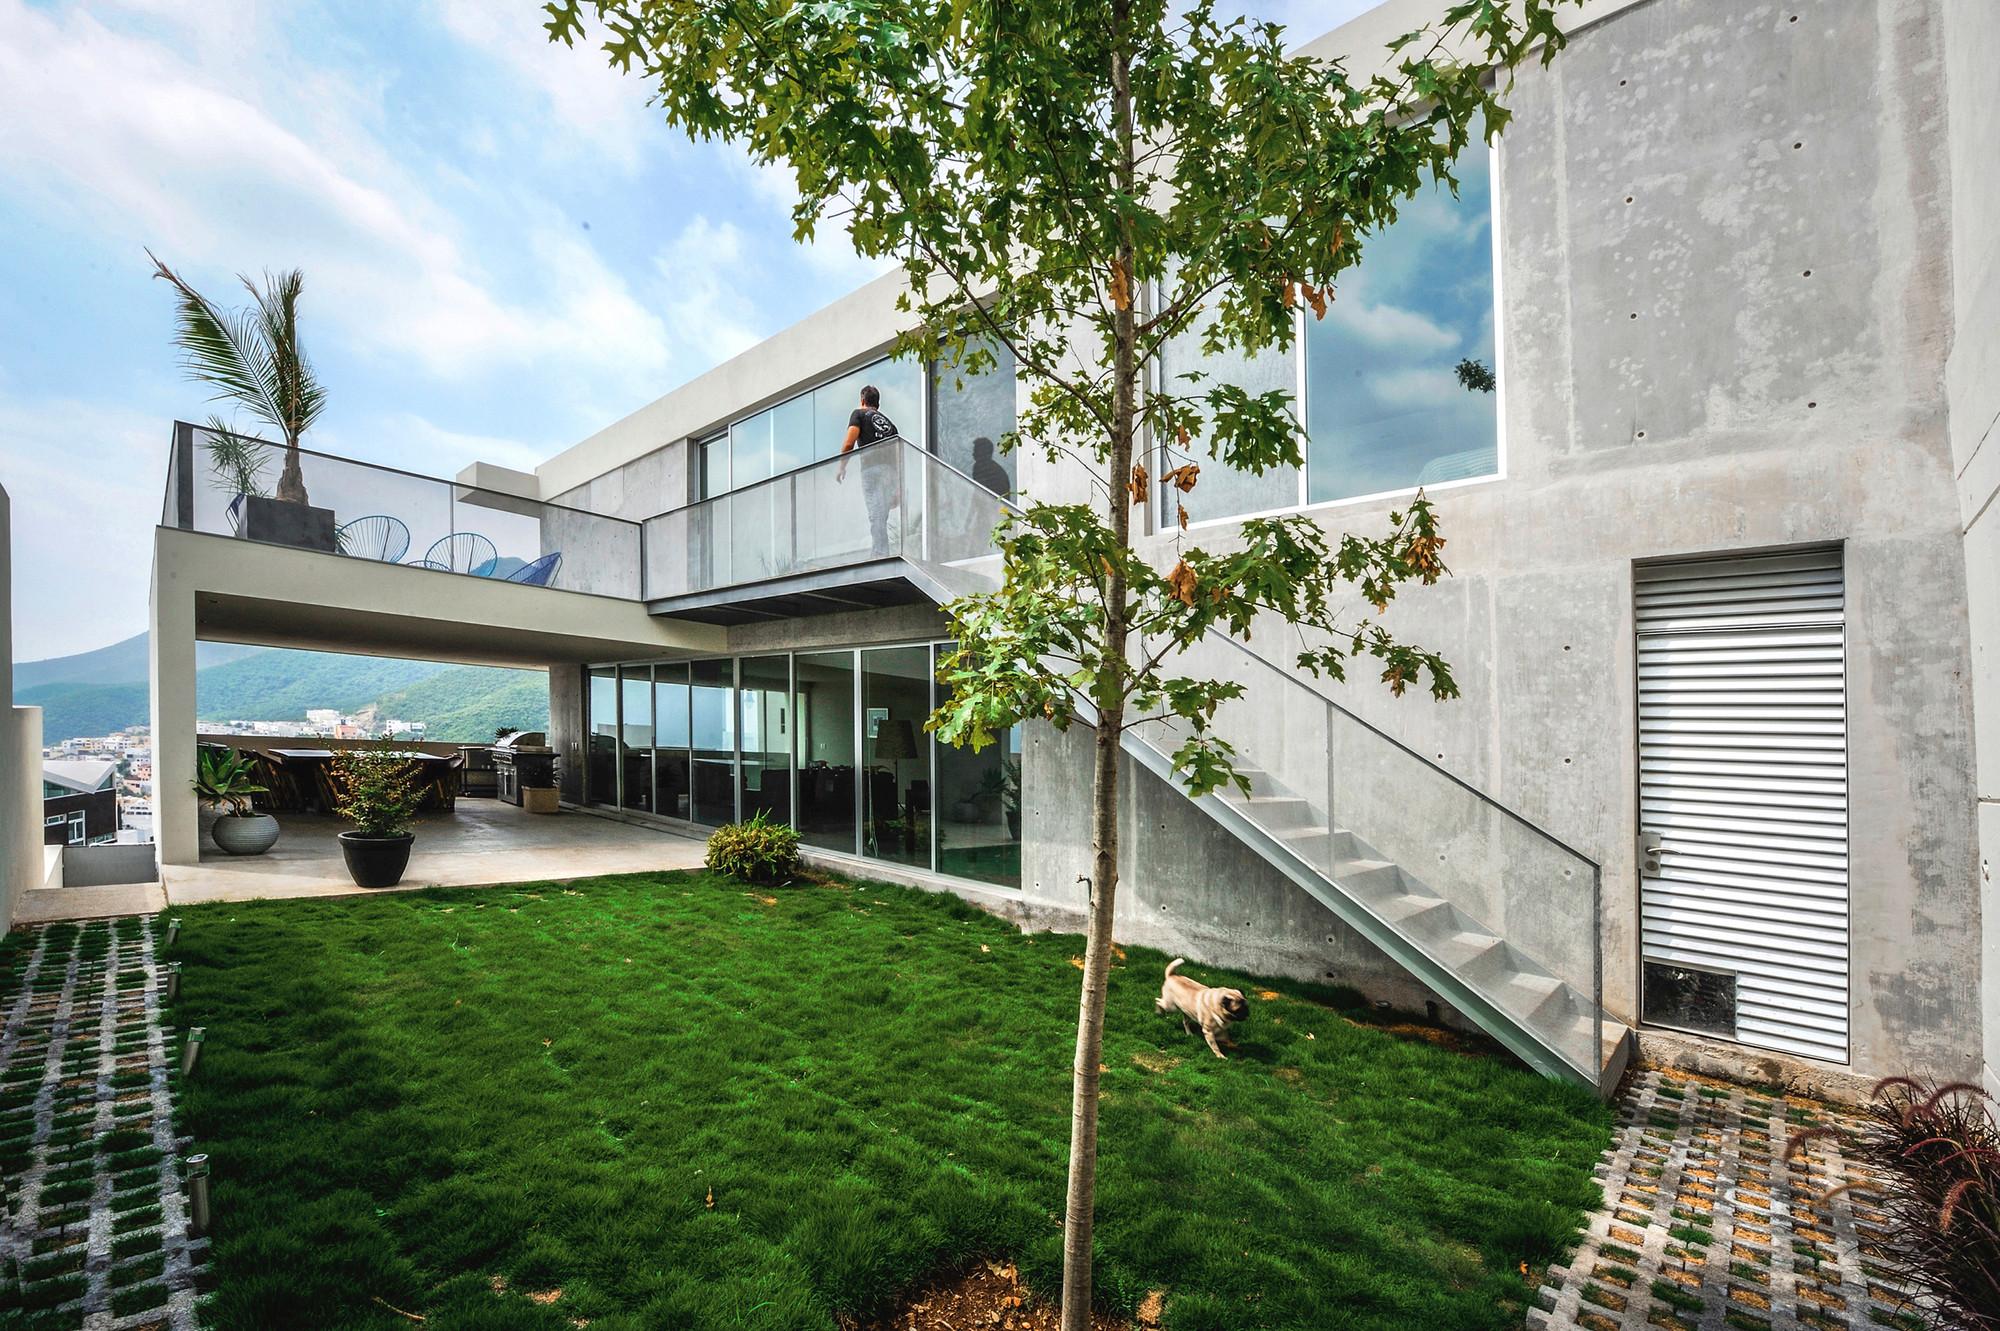 Casa ipe p 0 architecture plataforma arquitectura for Escaleras por fuera de la casa